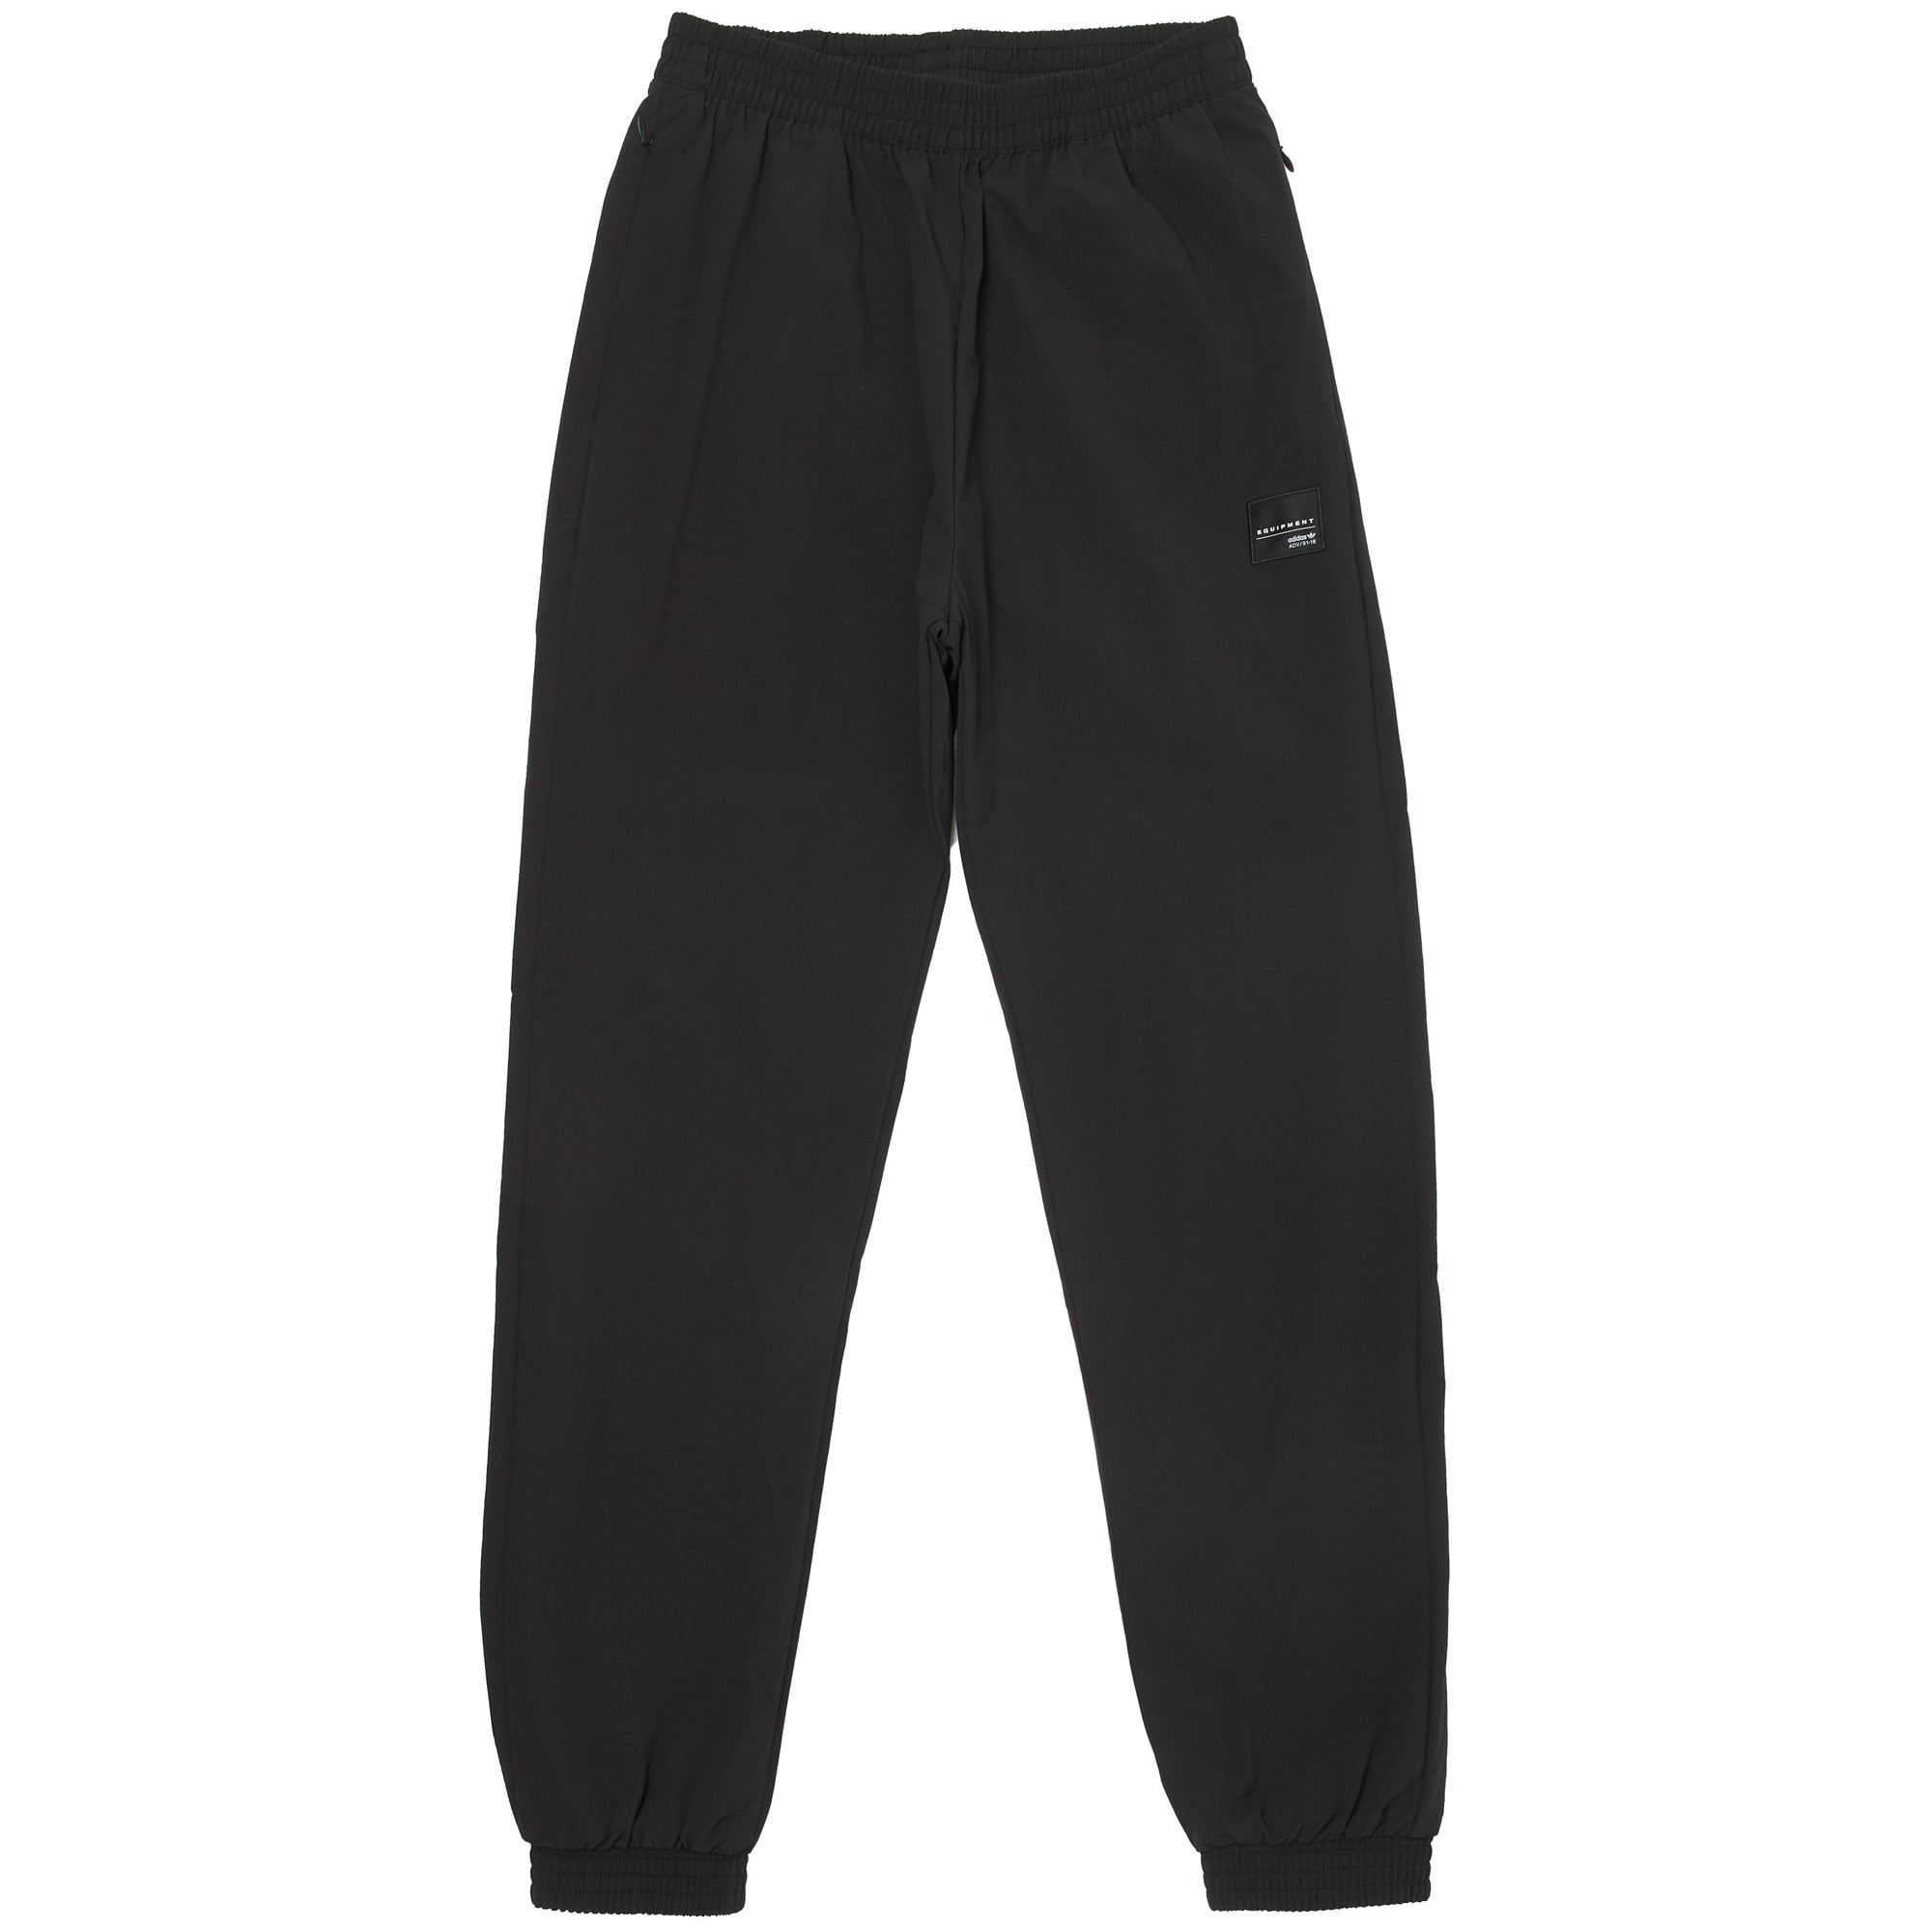 793ba000b03b7b Adidas Black EQT Pants CE2231   Stuarts London